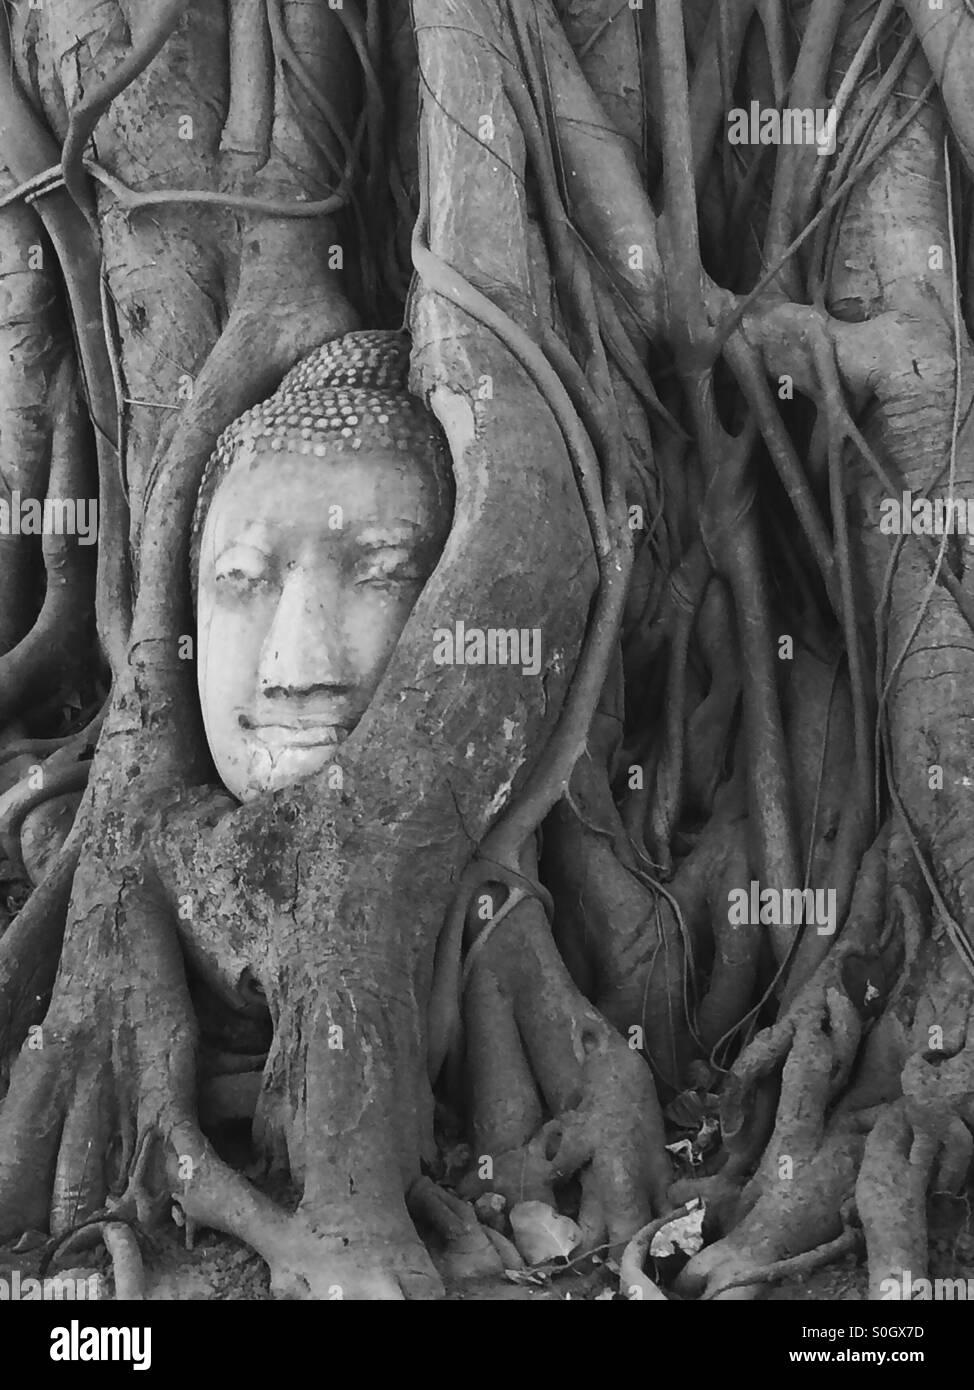 Stone Buddha head entwined in tree roots, Wat Mahathat, Ayutthaya, Thailand. Stock Photo